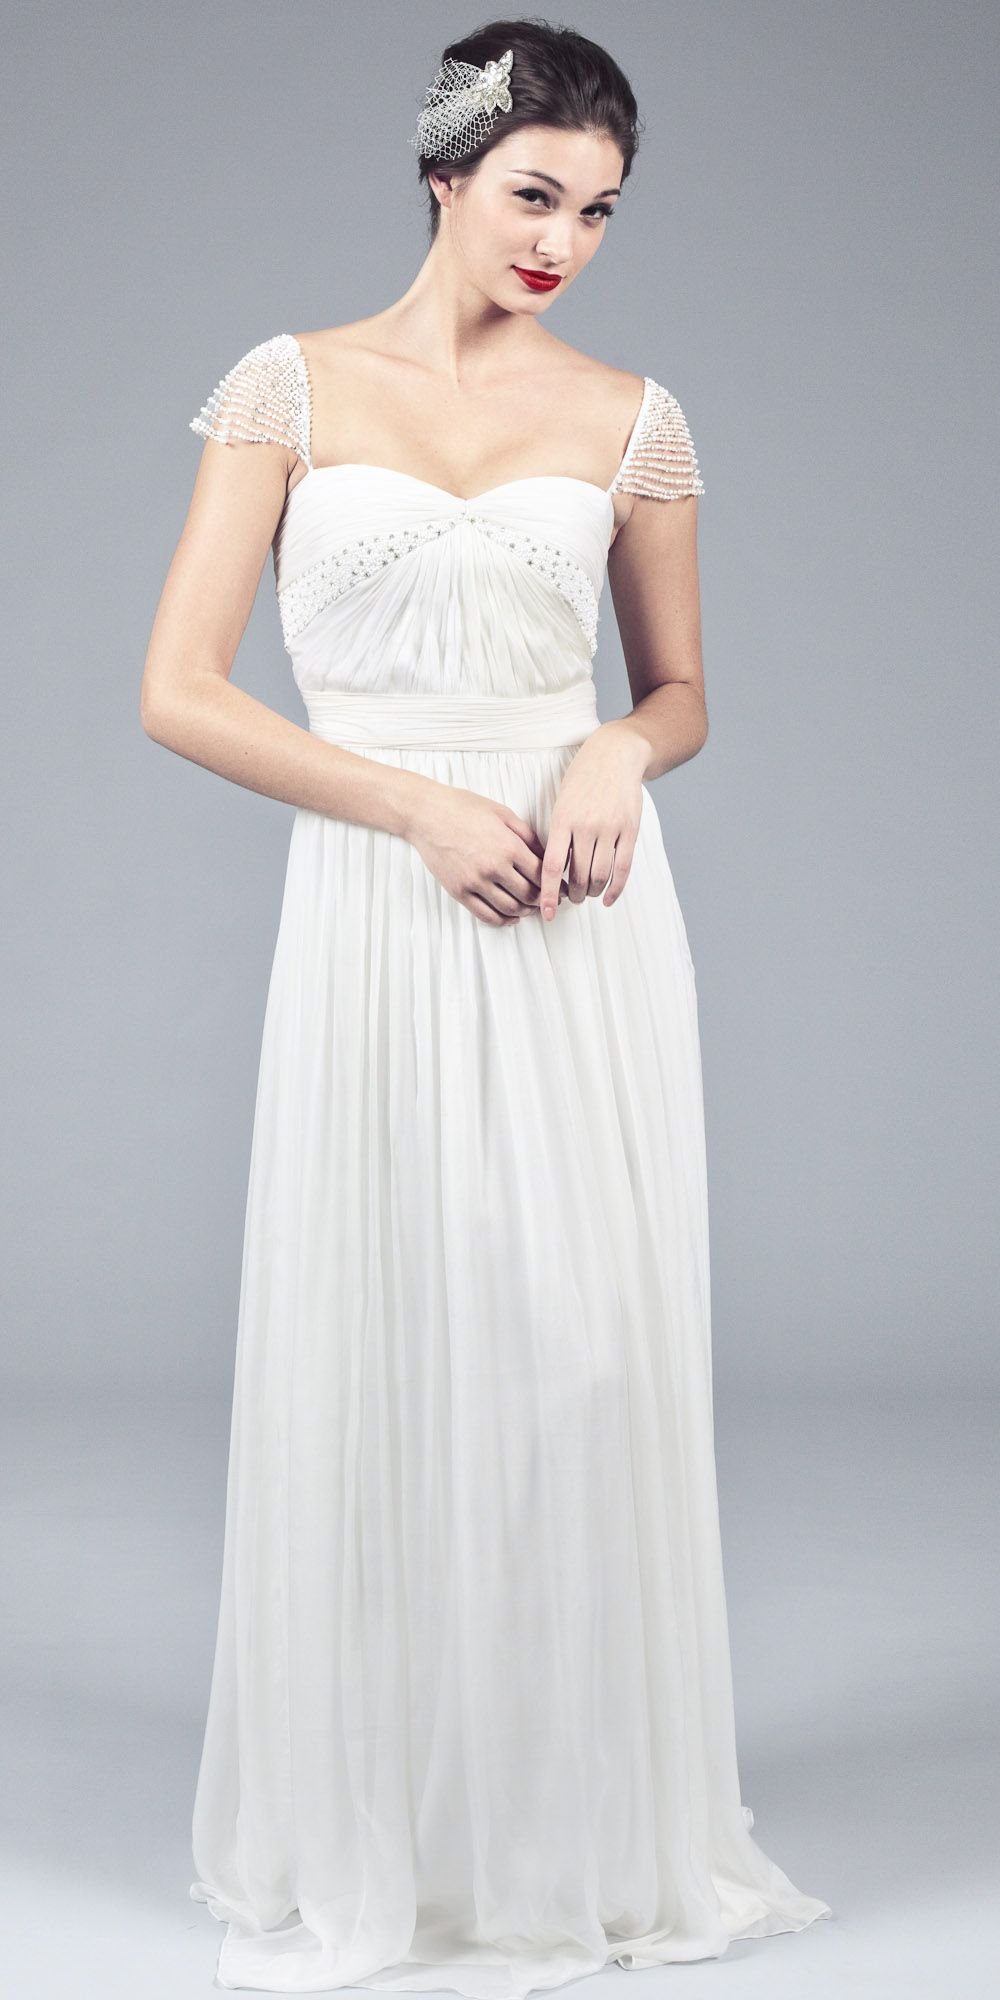 Tulle Organza Sweetheart Wedding Dress Custom 339 00 Via Etsy Wedding Dress Cap Sleeves Wedding Dress Trends Tulle Wedding Dress